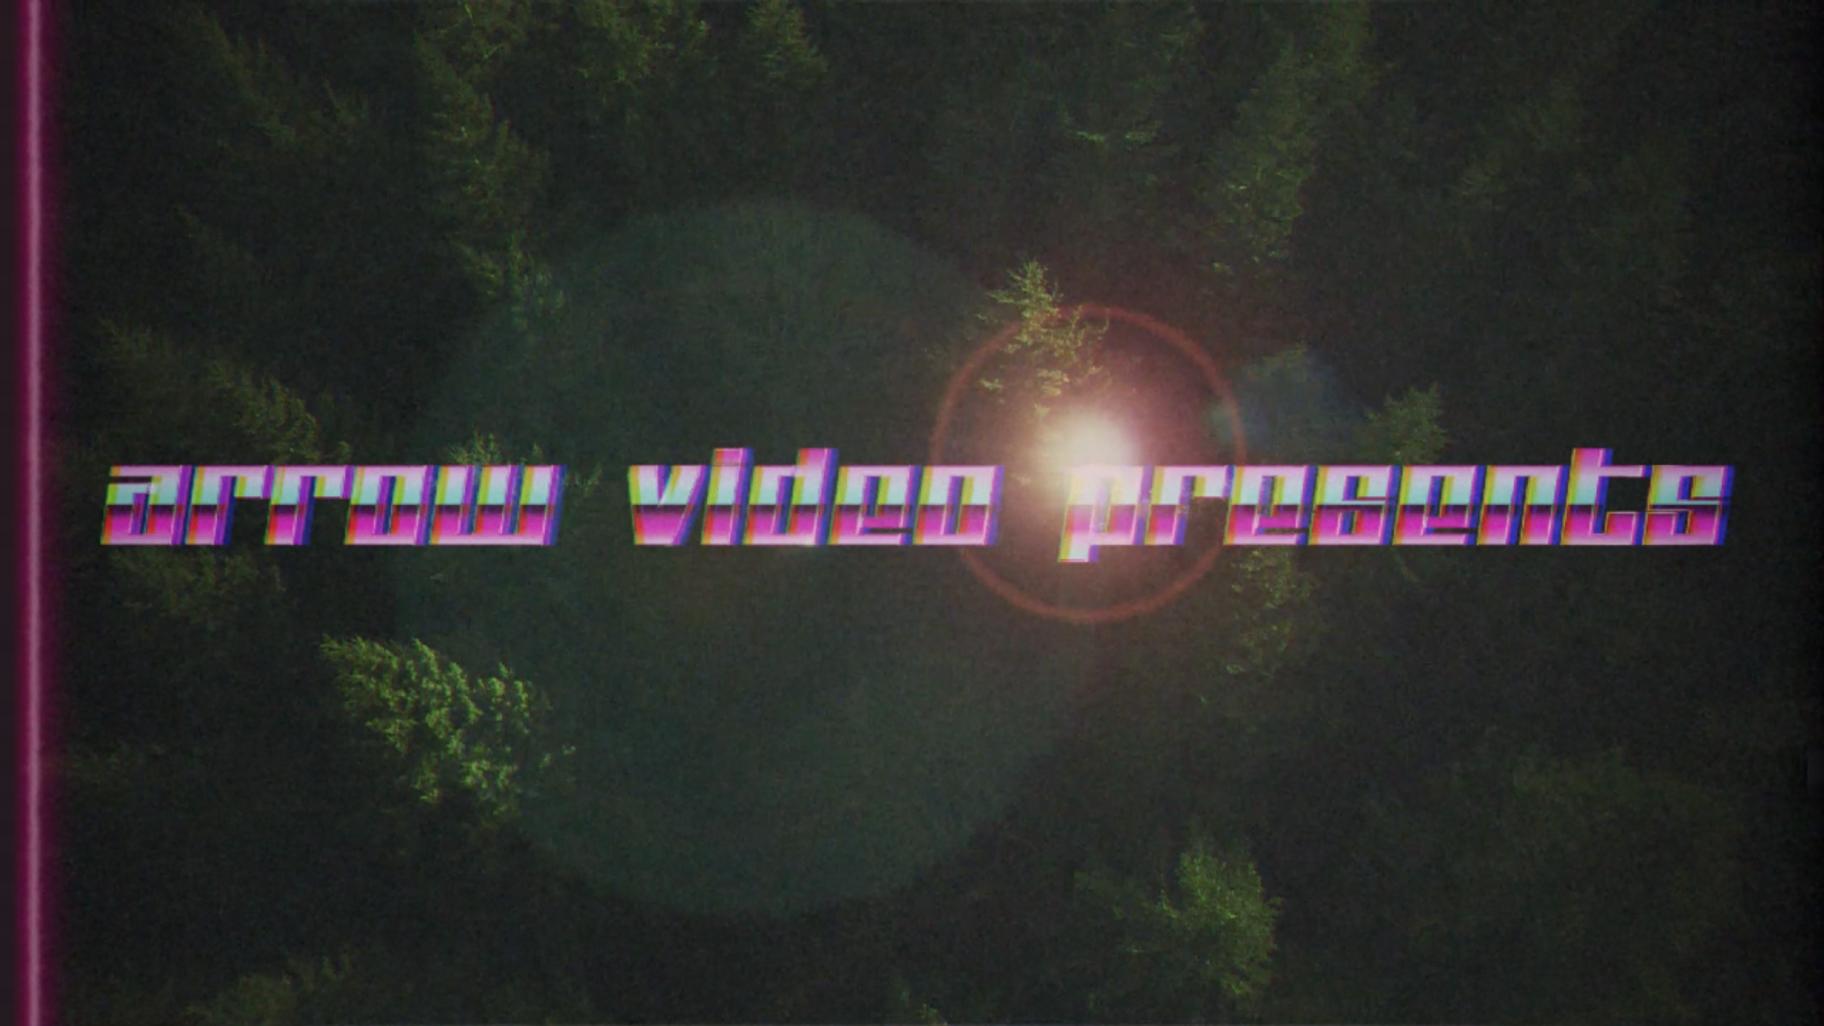 Arrow_Video_Short_Version.mp4